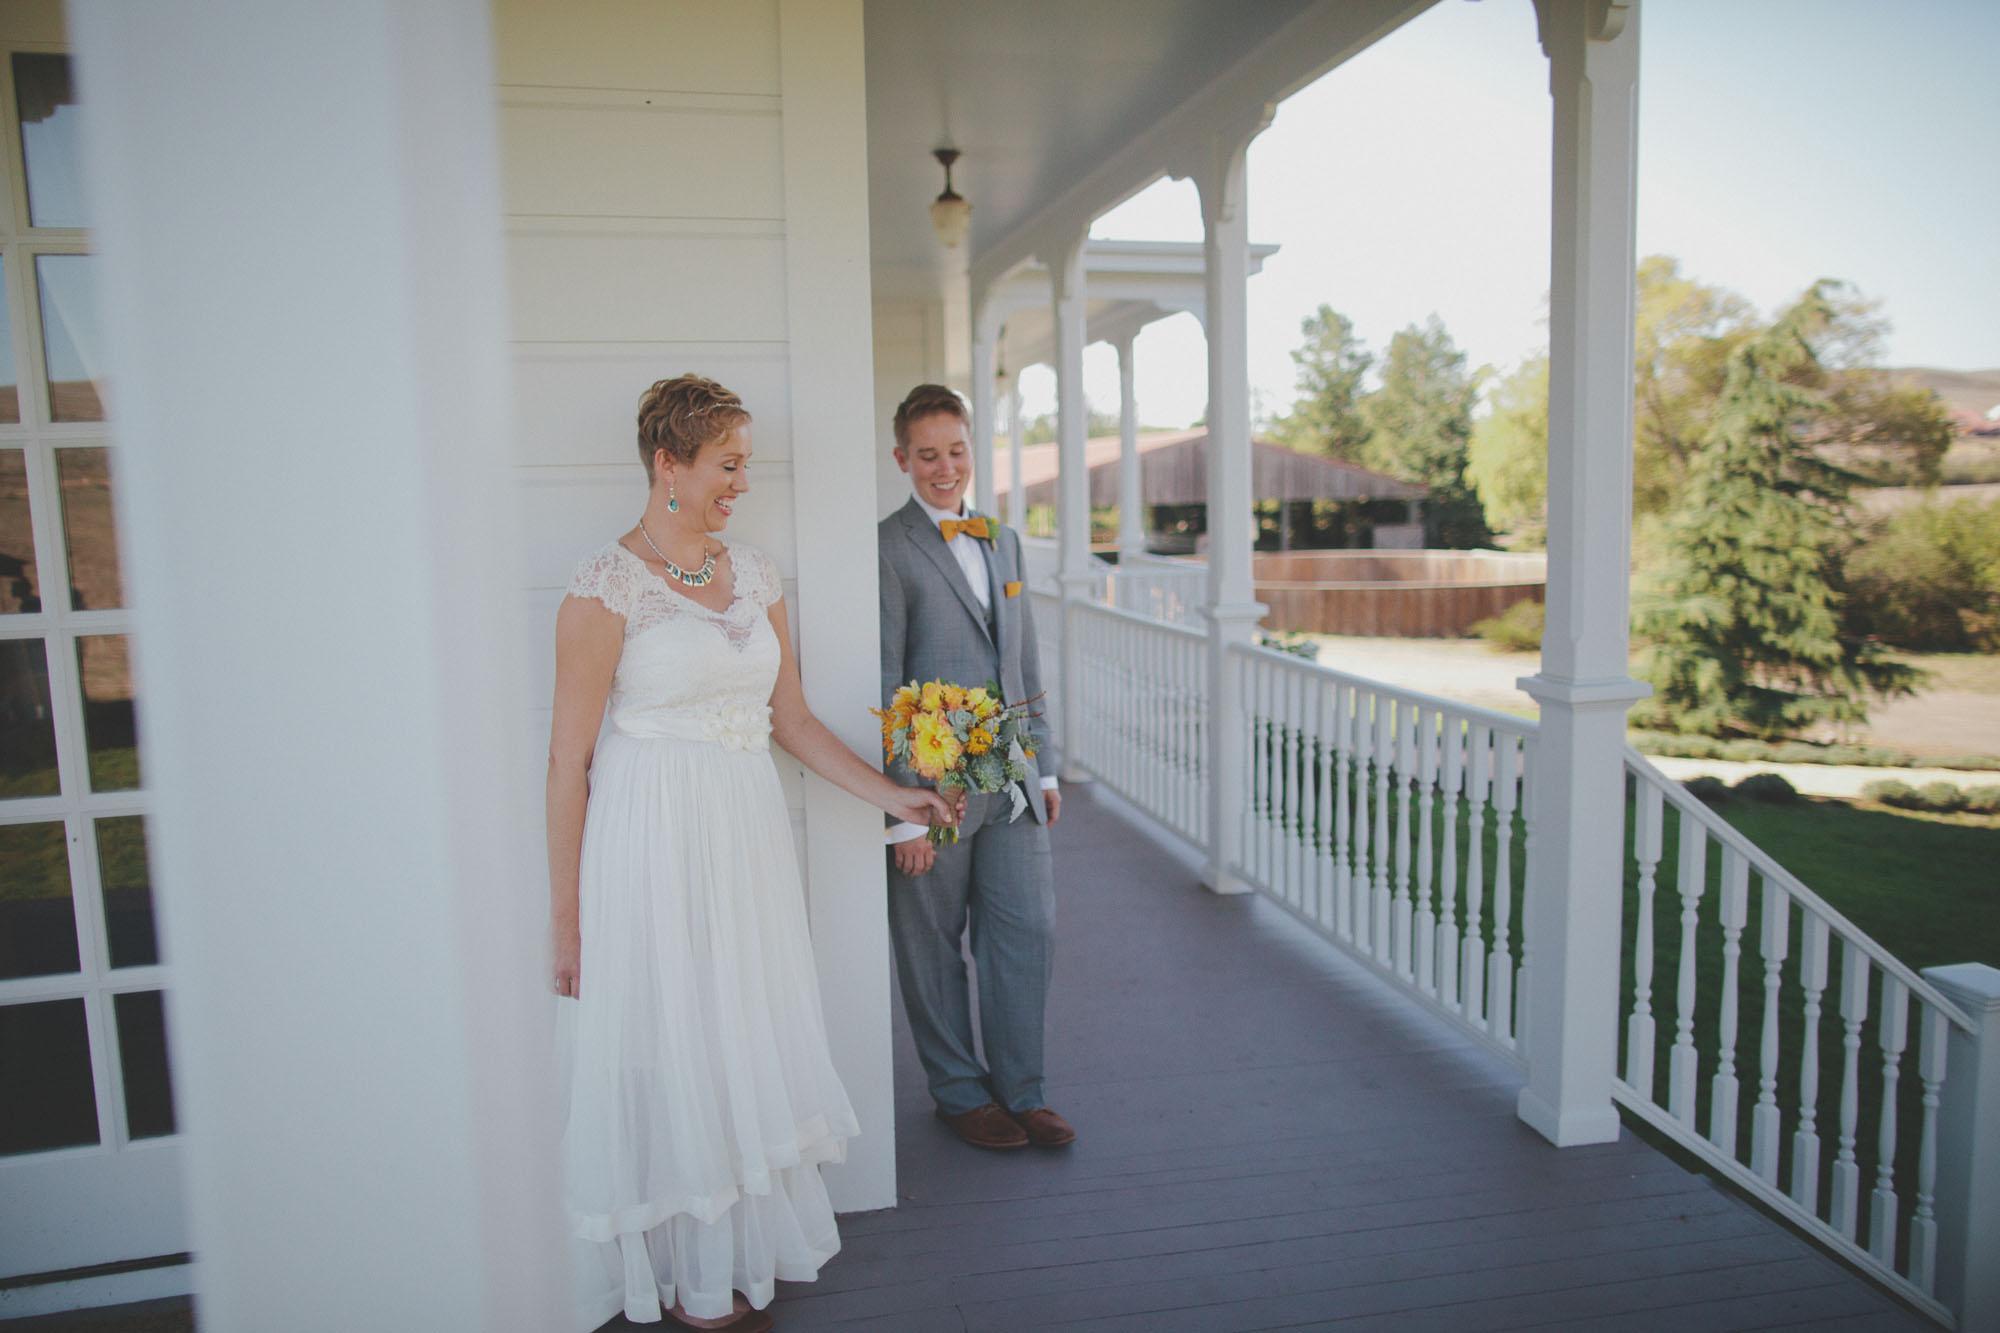 Gretchen_Gause_Petaluma_Olympias_Valley_Wedding_Photo-089.jpg